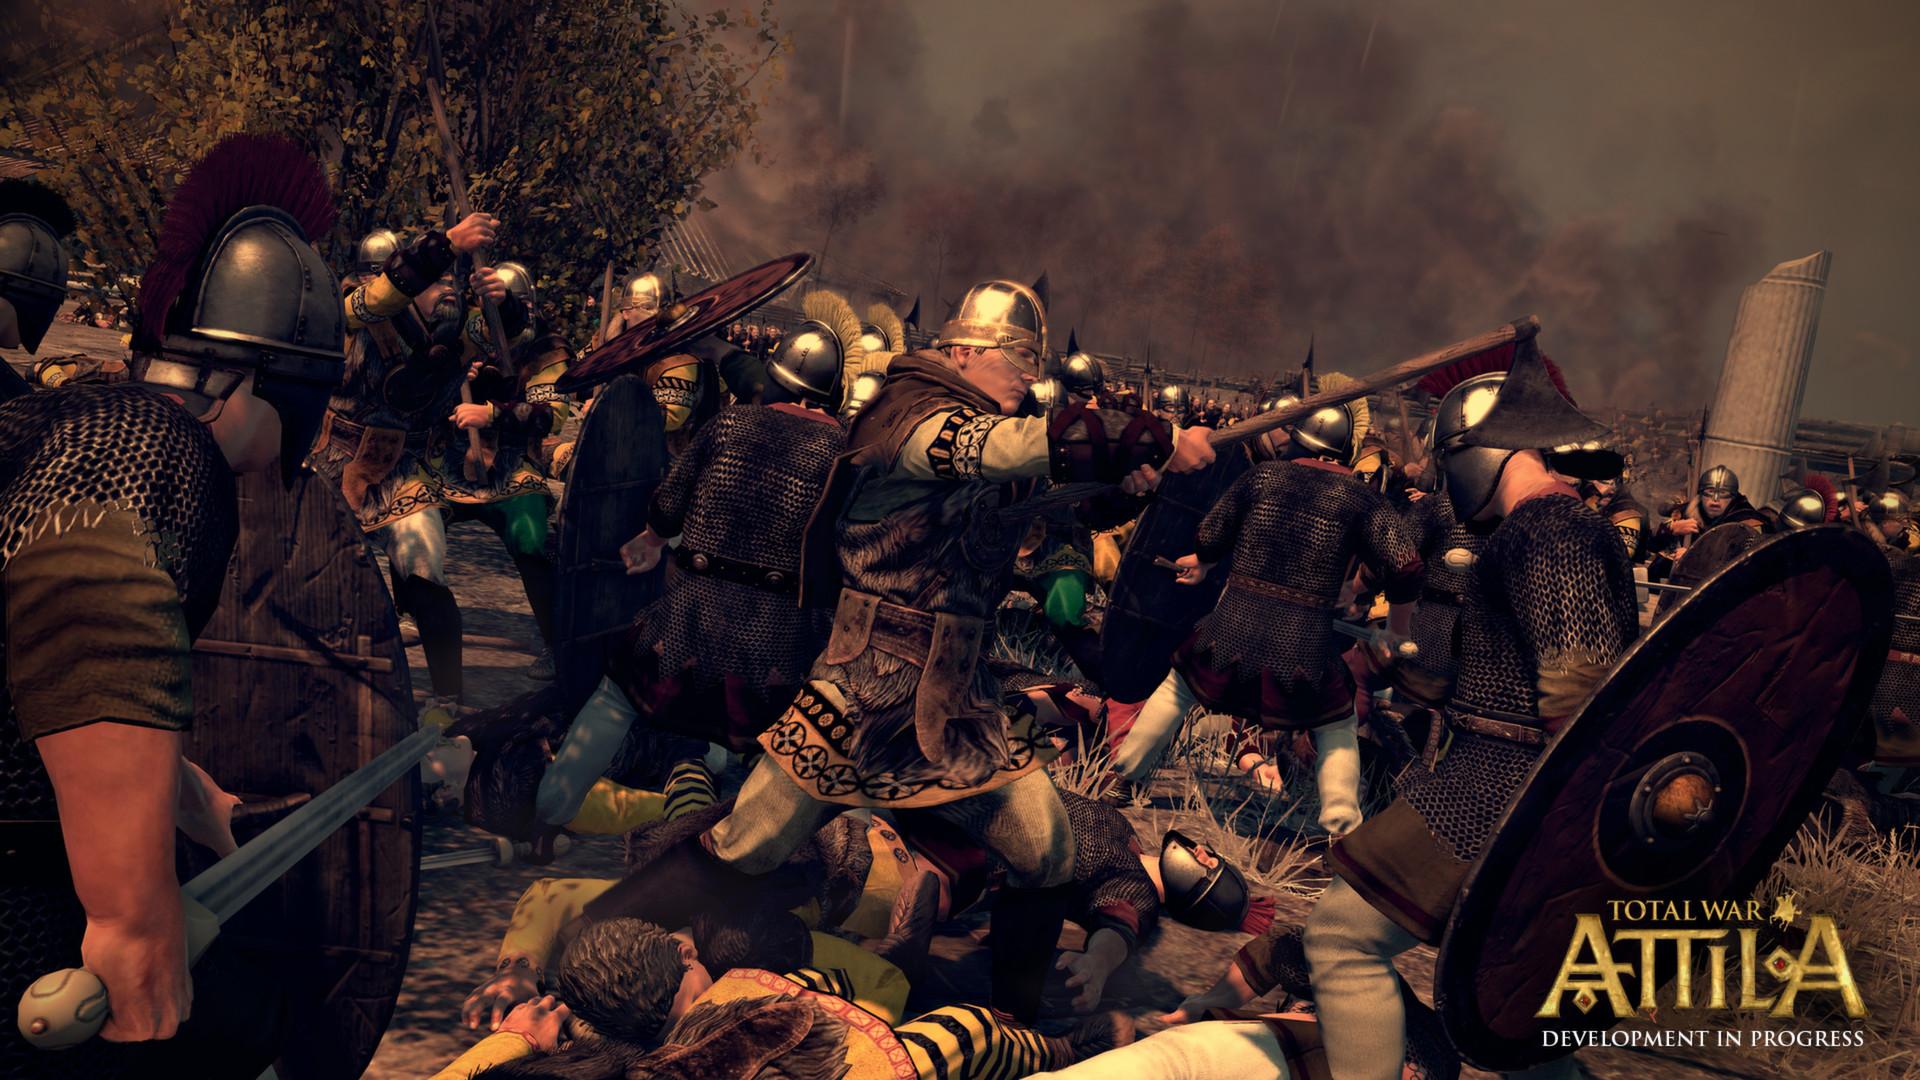 Total War Attila ESPAÑOL Full PC Incluye DLC (CPY) + REPACK 2 DVD5 (JPW) 4